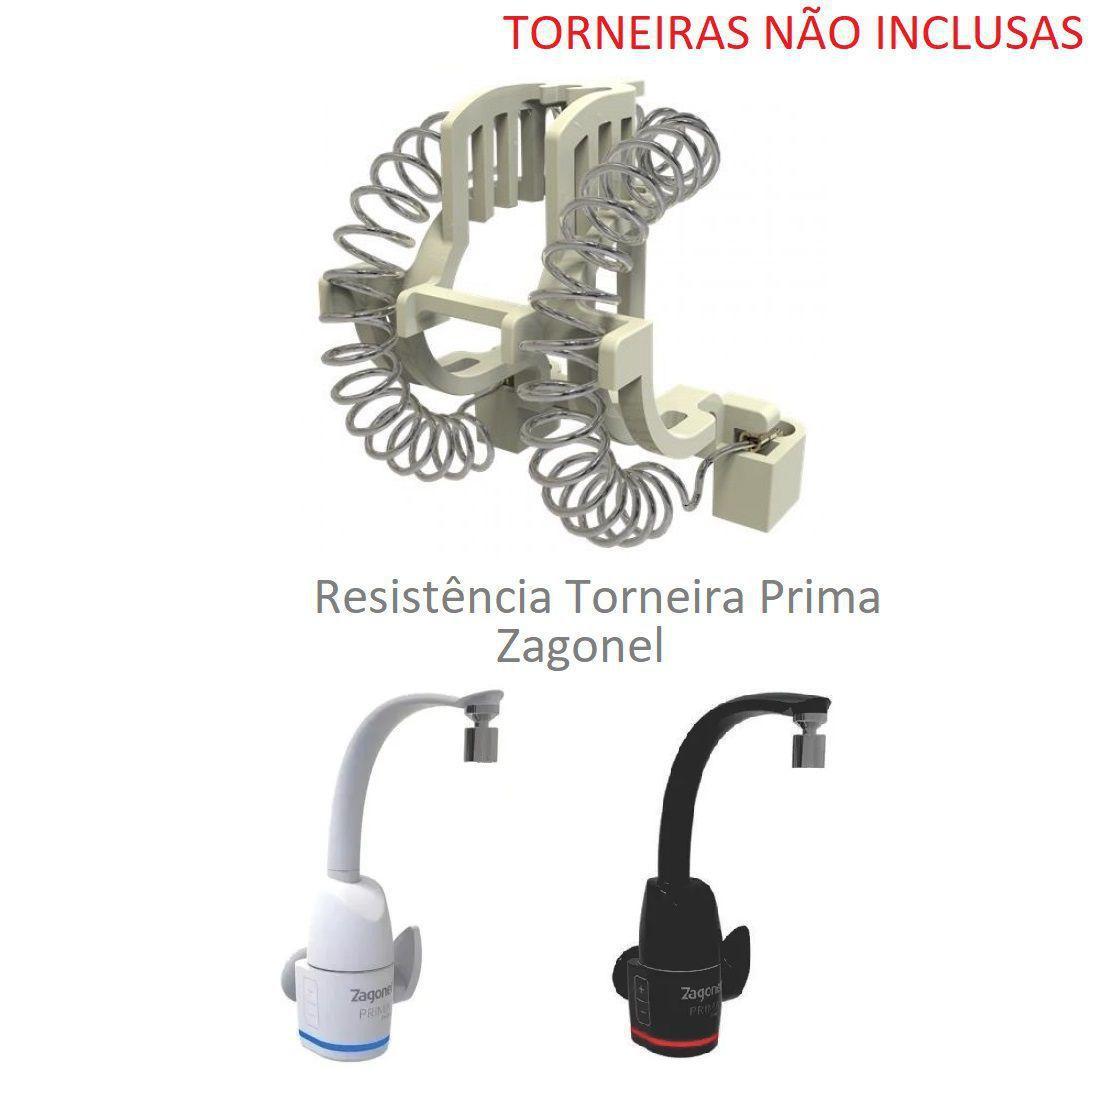 Resistencia eletr torneira prima 5500w 220v - Zagonel - Resistências  Elétricas - Magazine Luiza